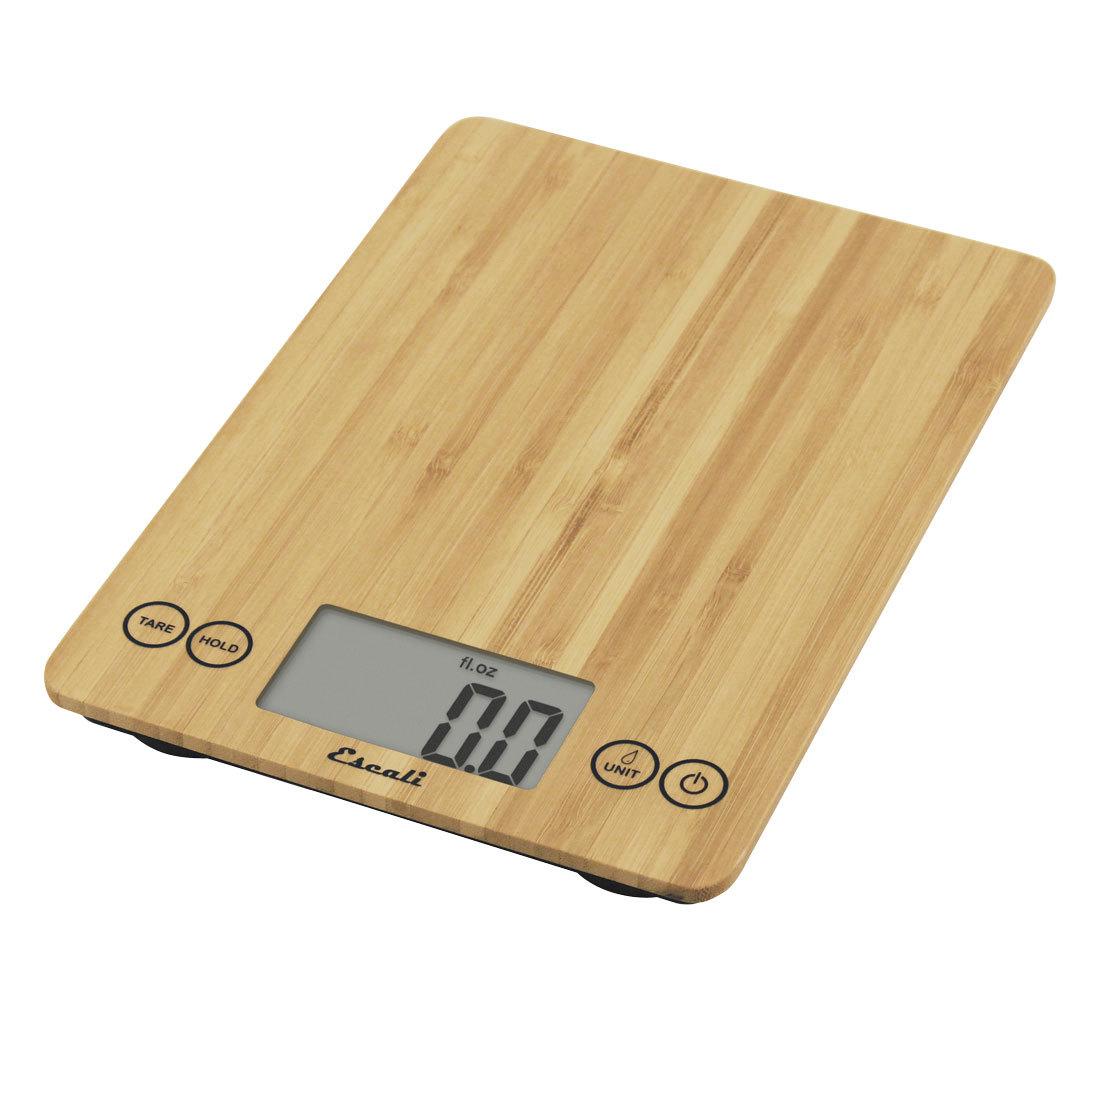 Carolina Coffee Escali Arti Bamboo Scale